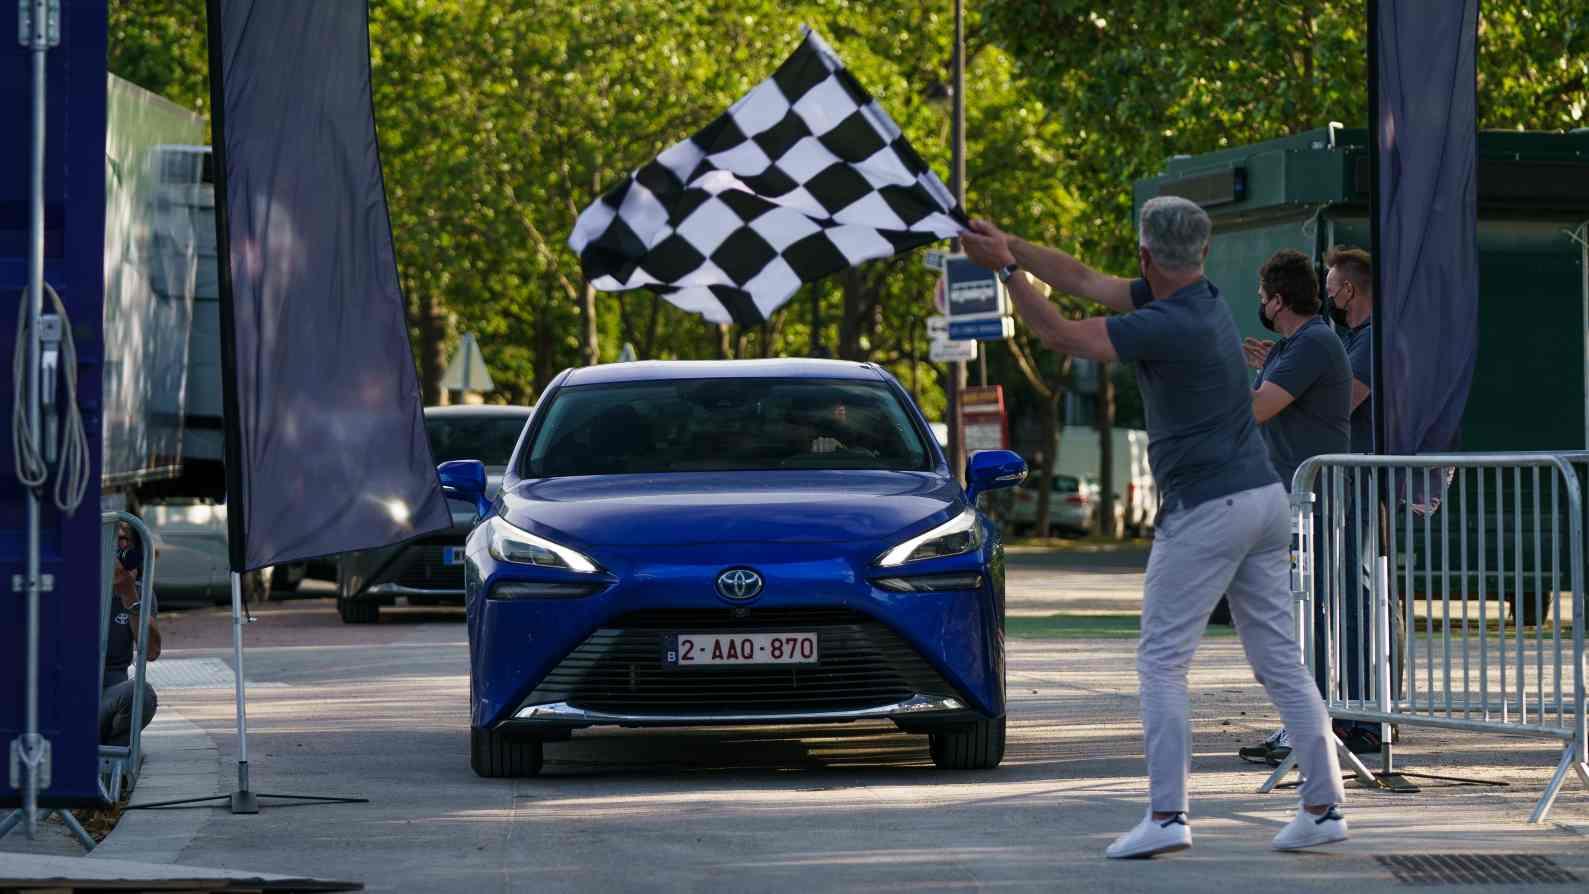 Toyota Mirai sets world record, covers over 1,000 km on a single fill of hydrogen- Technology News, Gadgetclock